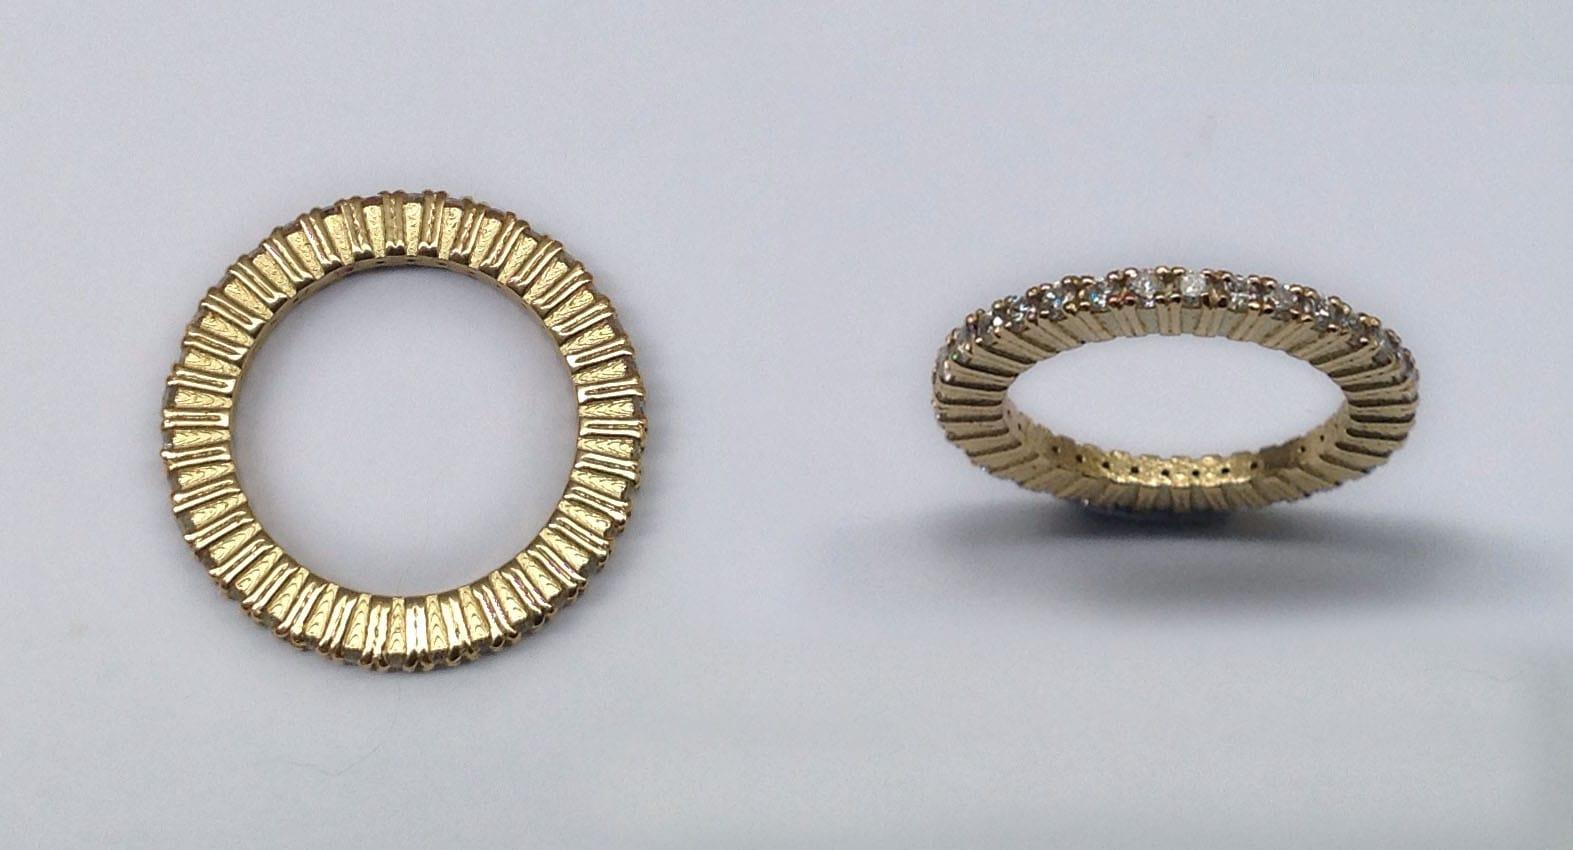 Eternity ring, 18 carat yellow gold with 38 brilliant cut diamonds